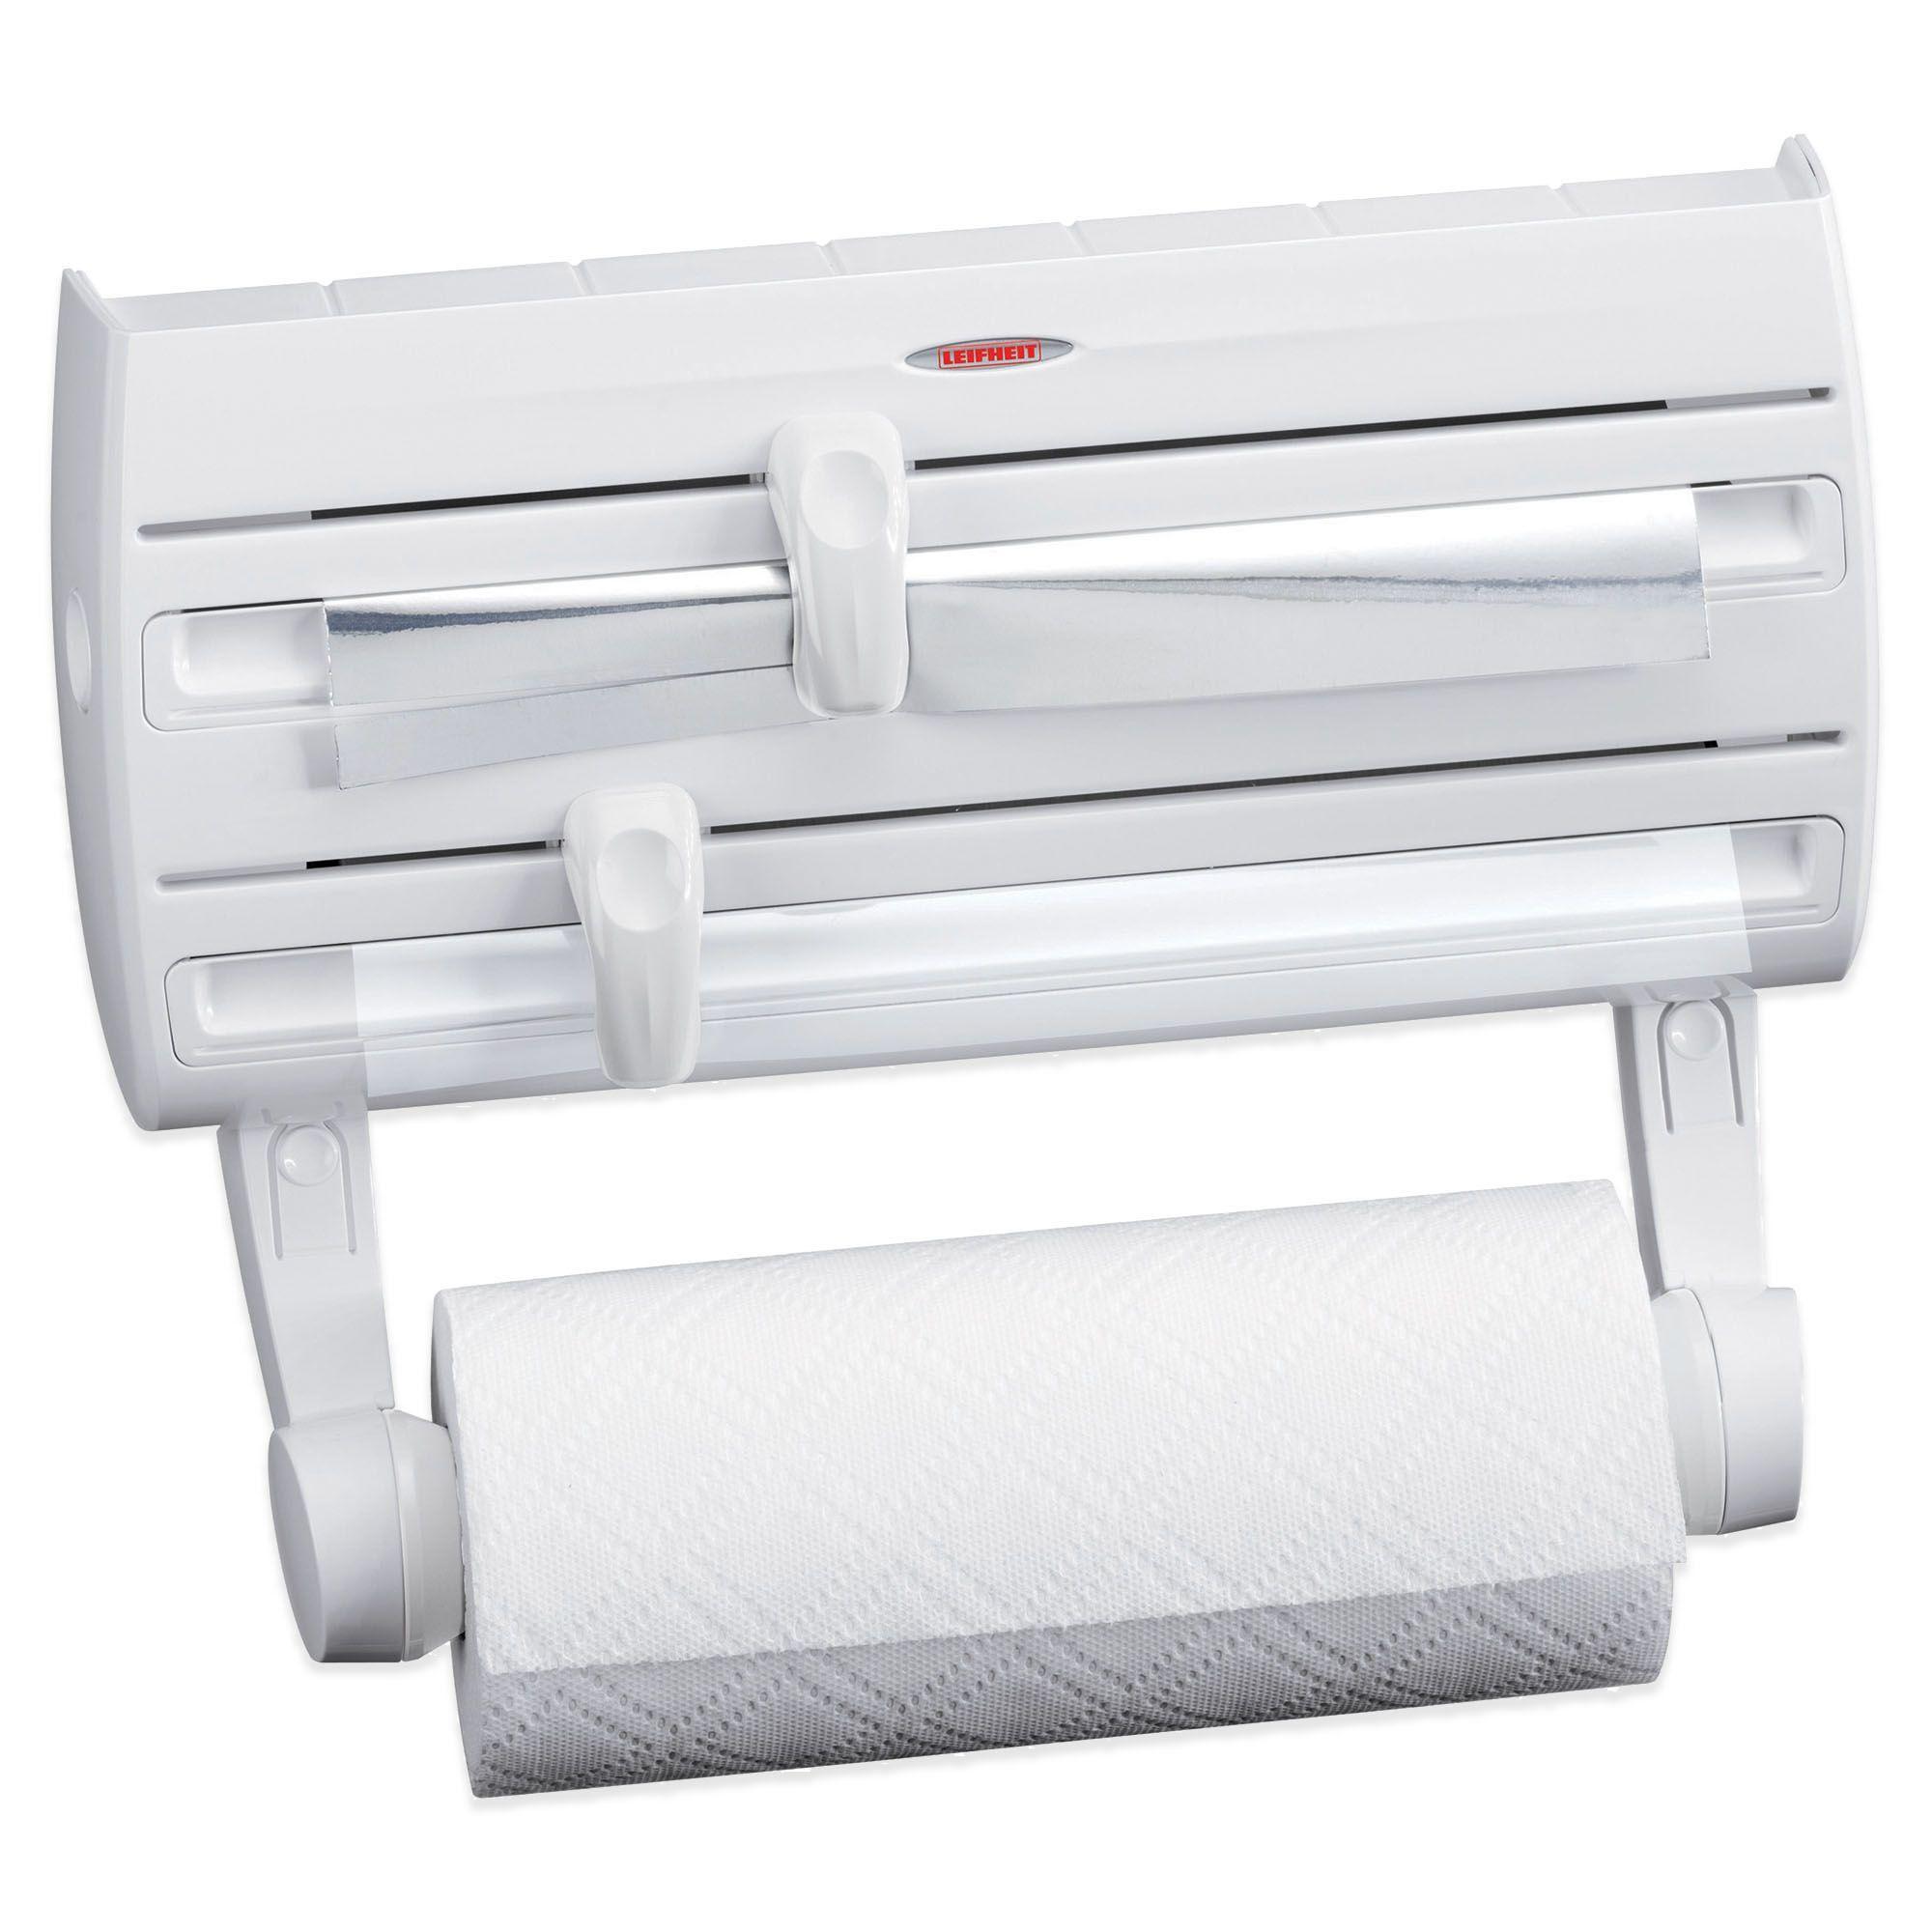 Wrap Dispenser Kitchen Wrap Foil Dispenser And